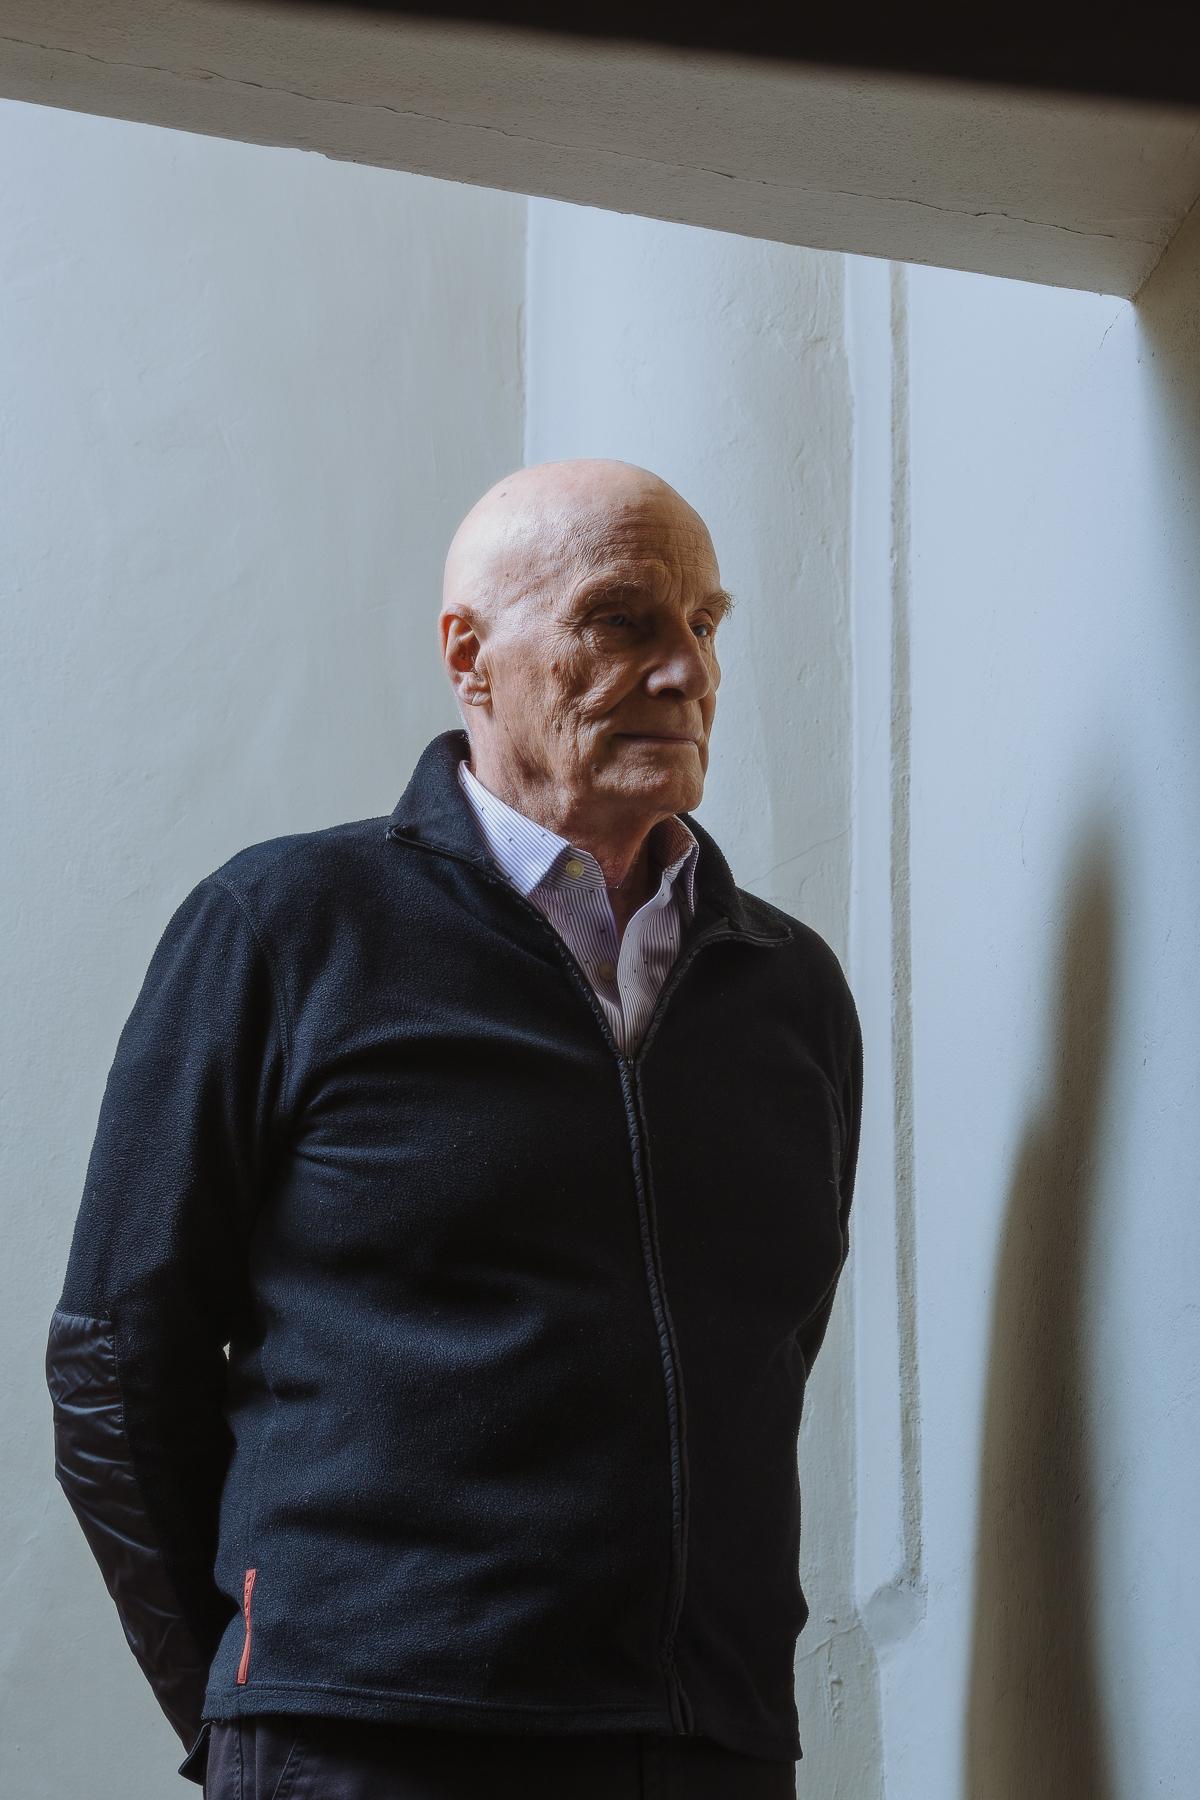 Barbet Schroeder, portrait, cinemathèque suisse, lausanne